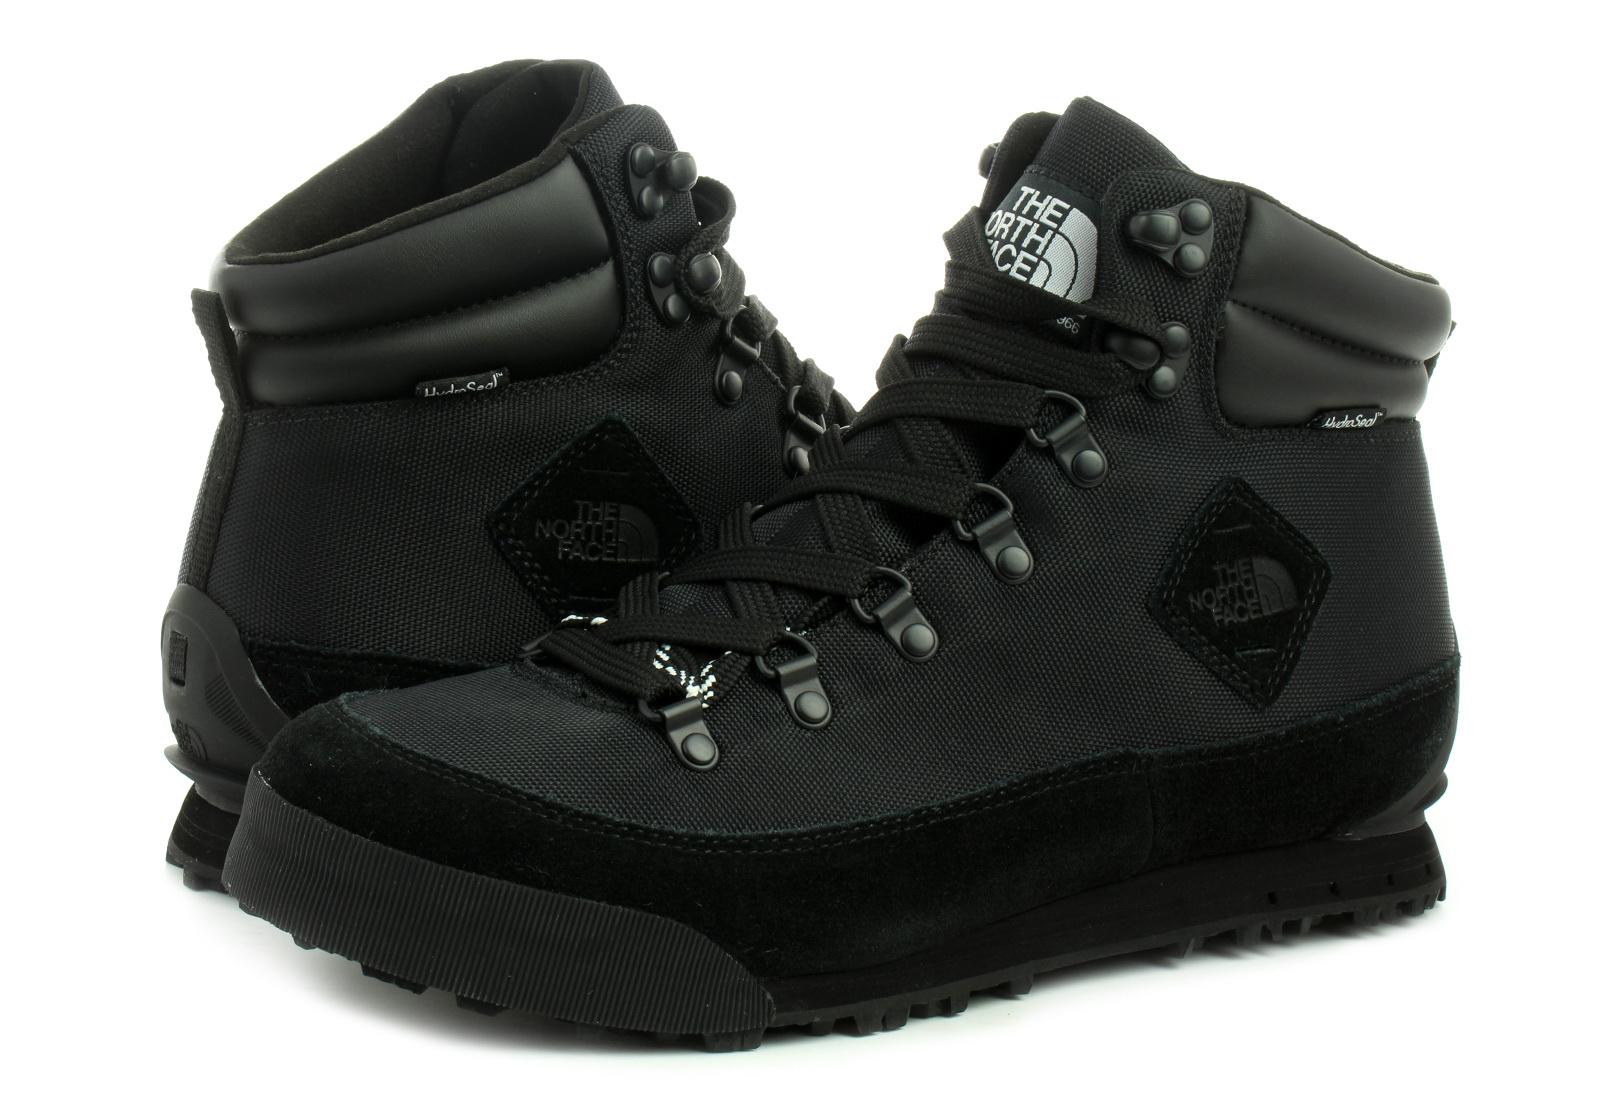 The North Face Bakancs Back - 2 - Berkley Boot